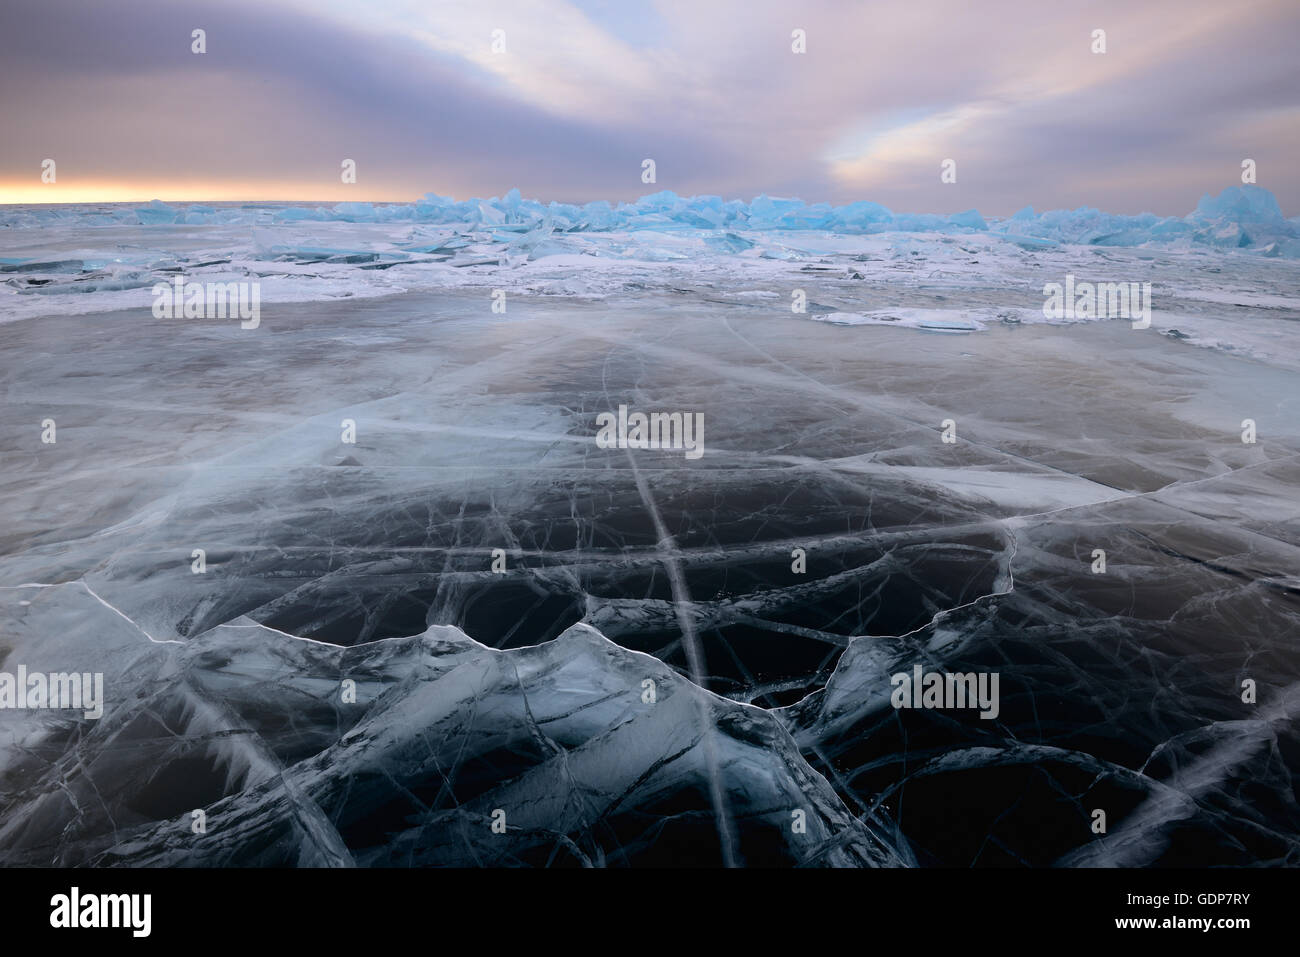 Patterned ice, Baikal Lake, Olkhon Island, Siberia, Russia - Stock Image